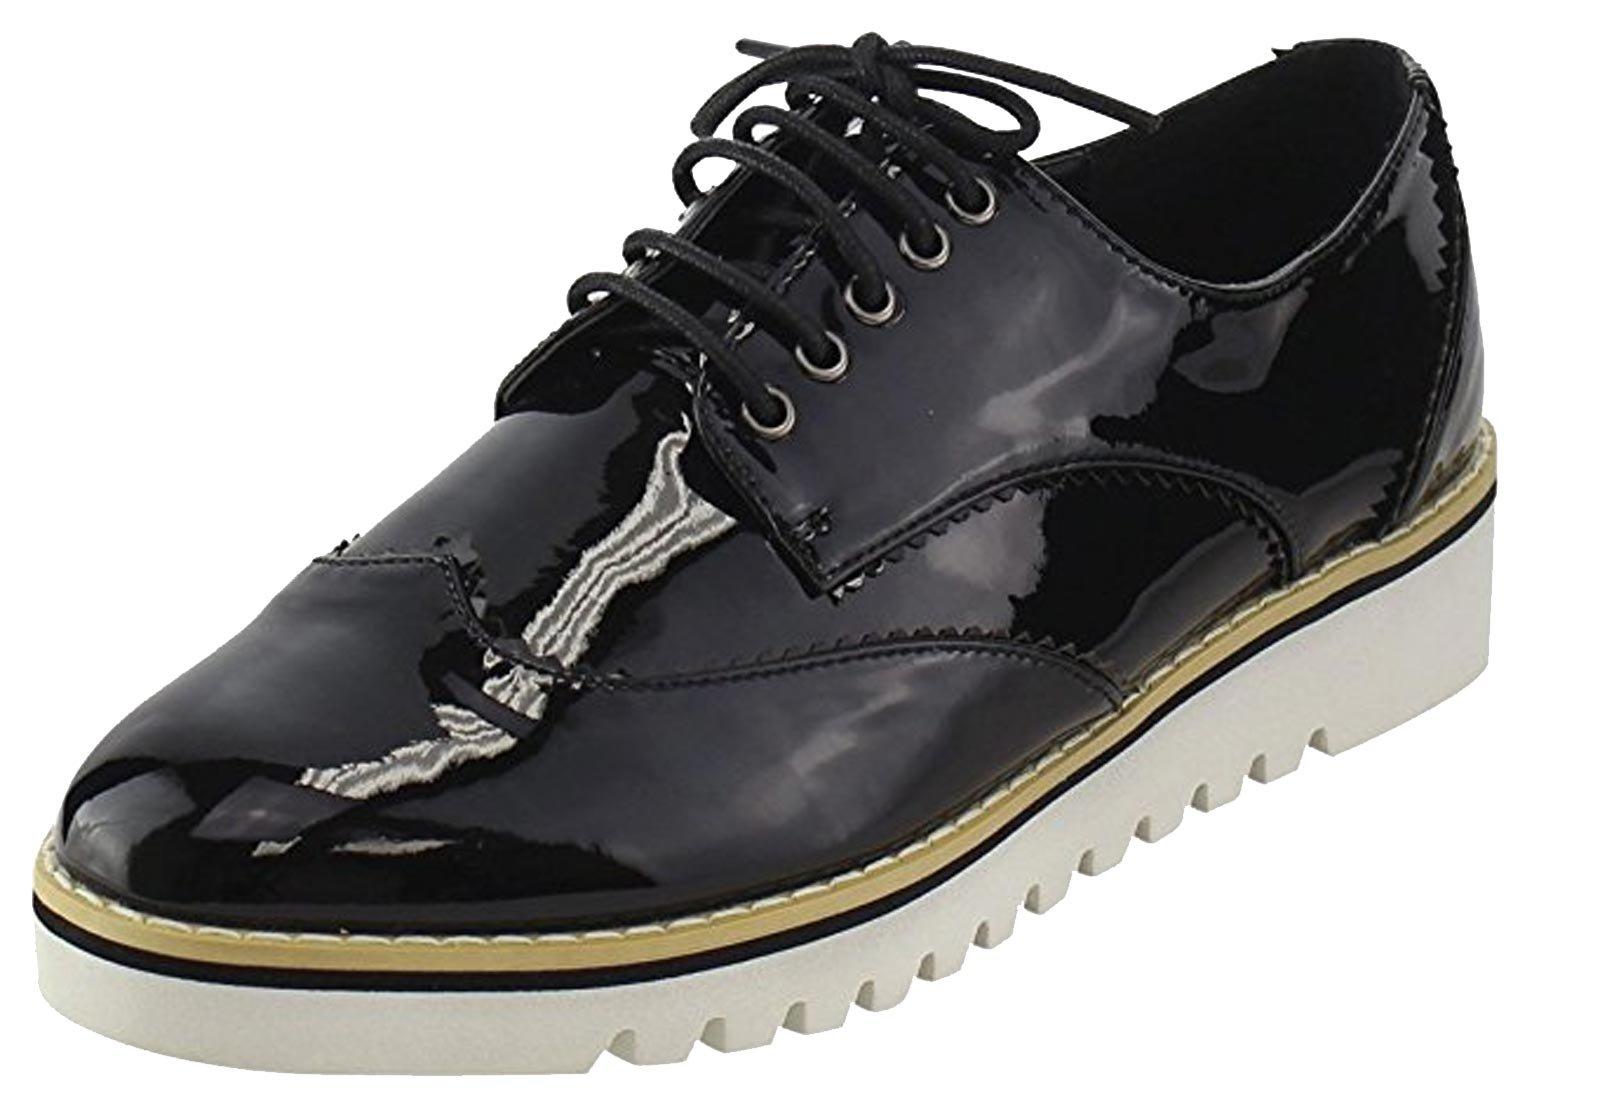 CAPE ROBBIN Women's Fashion Patent Metallic Leather Lugged Sole Flatform Lace Up Platform Oxford Sneakers Shoes (5.5 B(M) US, Black)